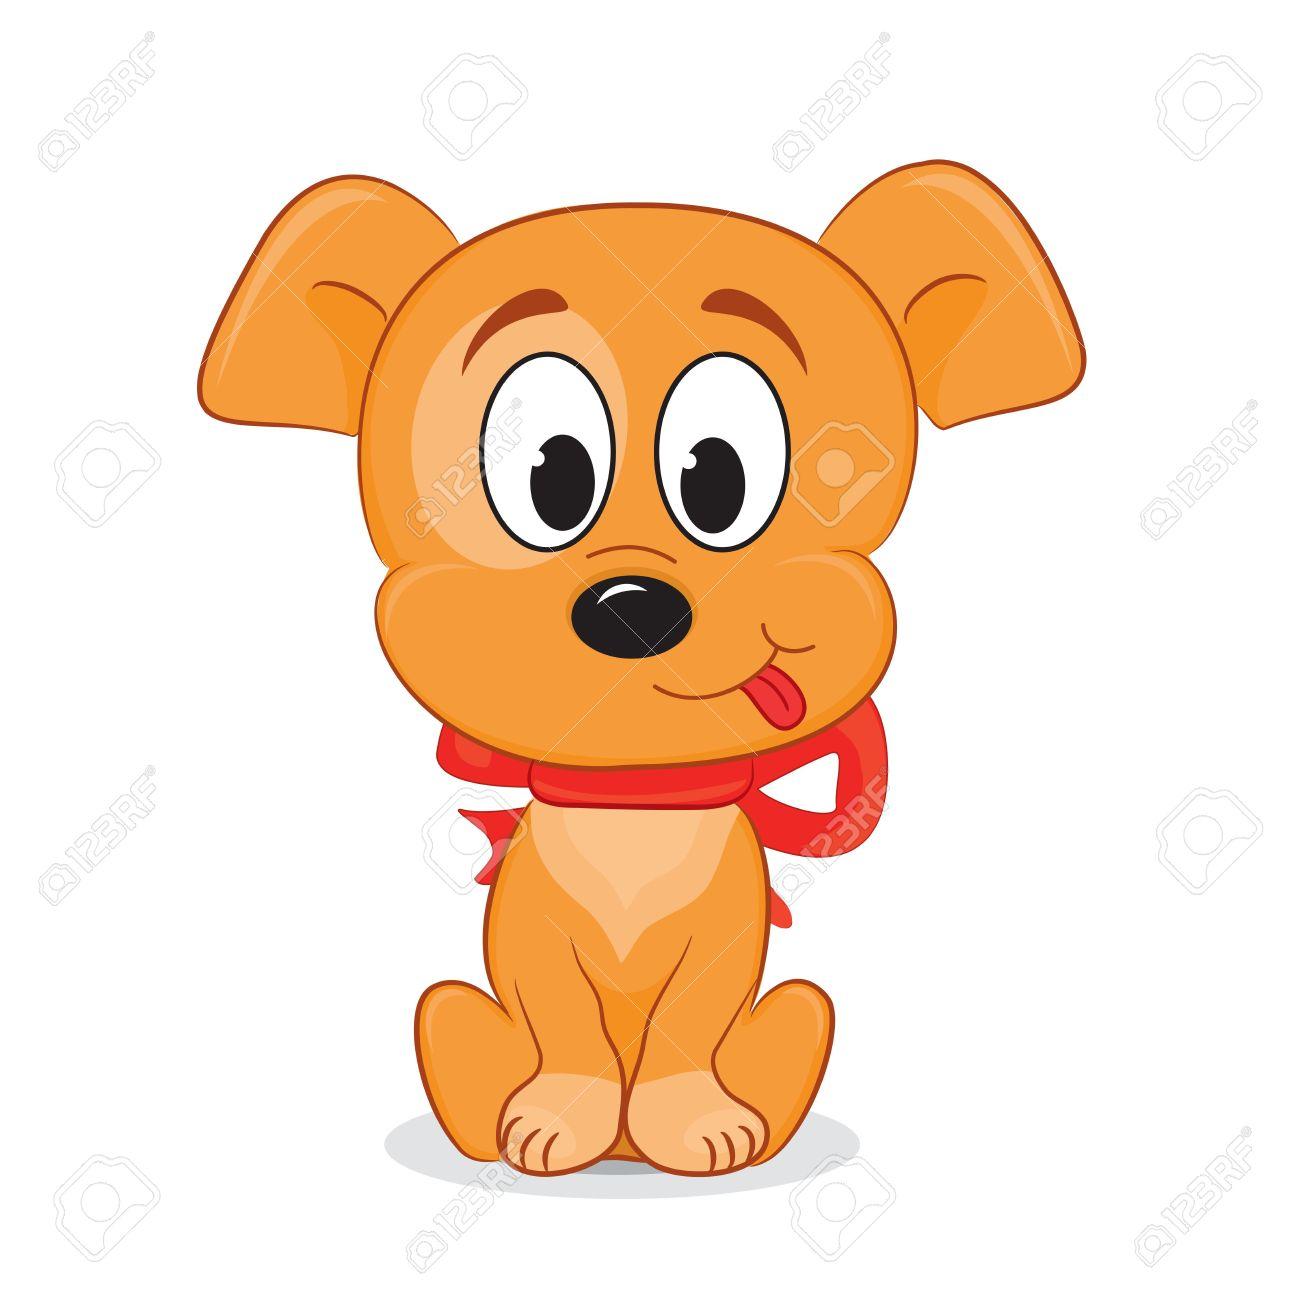 A Cute Cartoon Dog Vector Illustration Royalty Free Cliparts Vectors And Stock Illustration Image 18406720